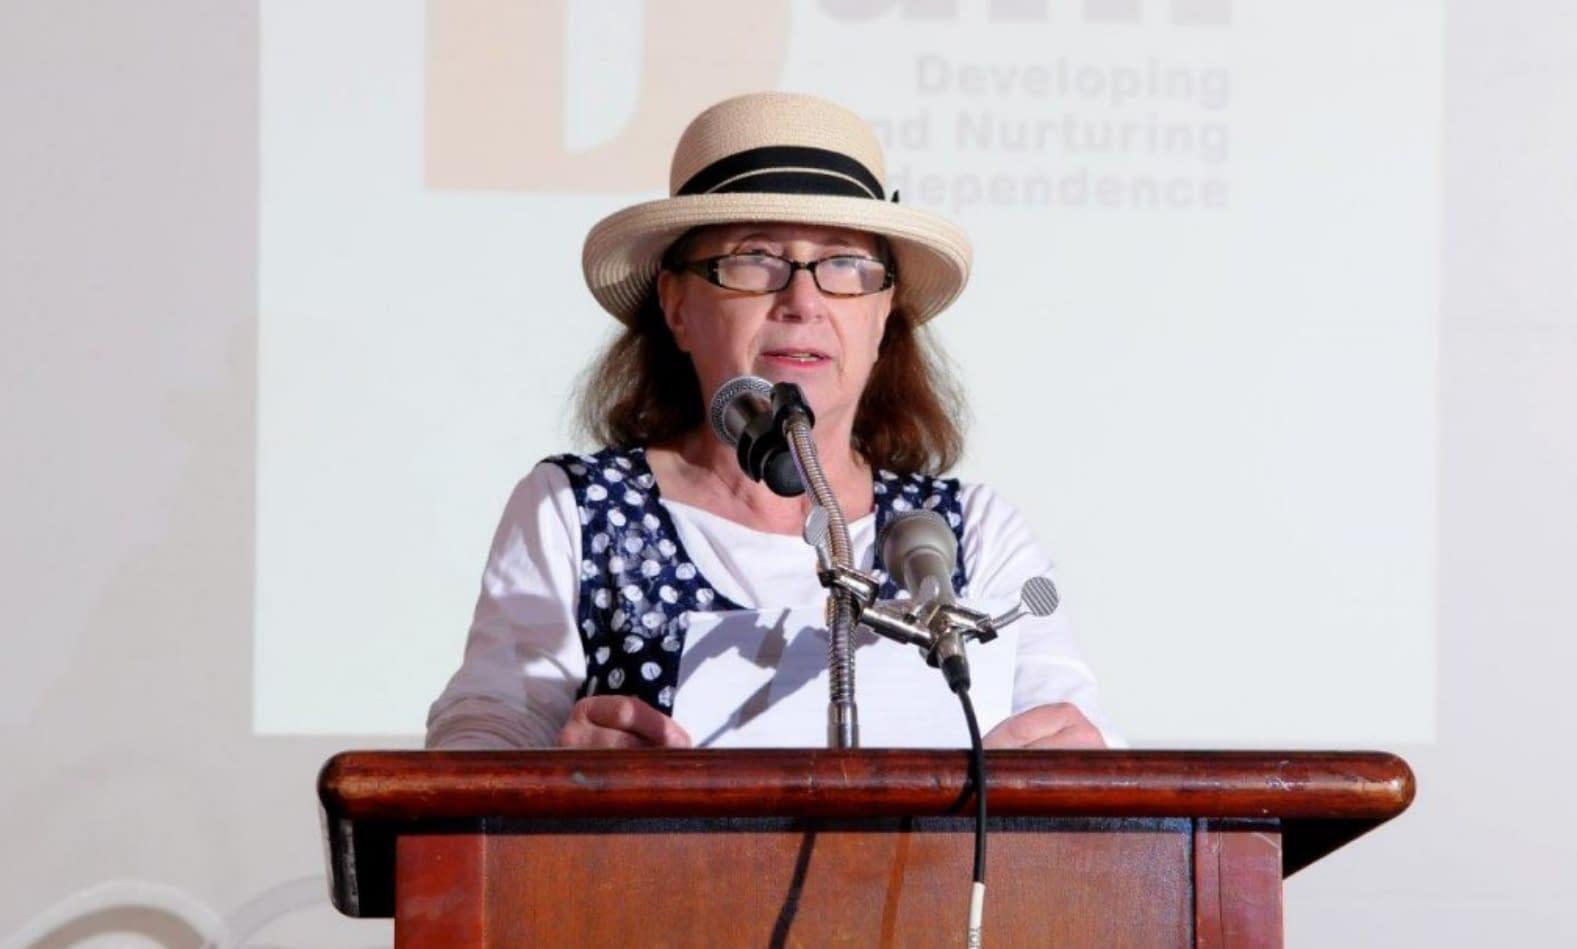 Susie Sokol